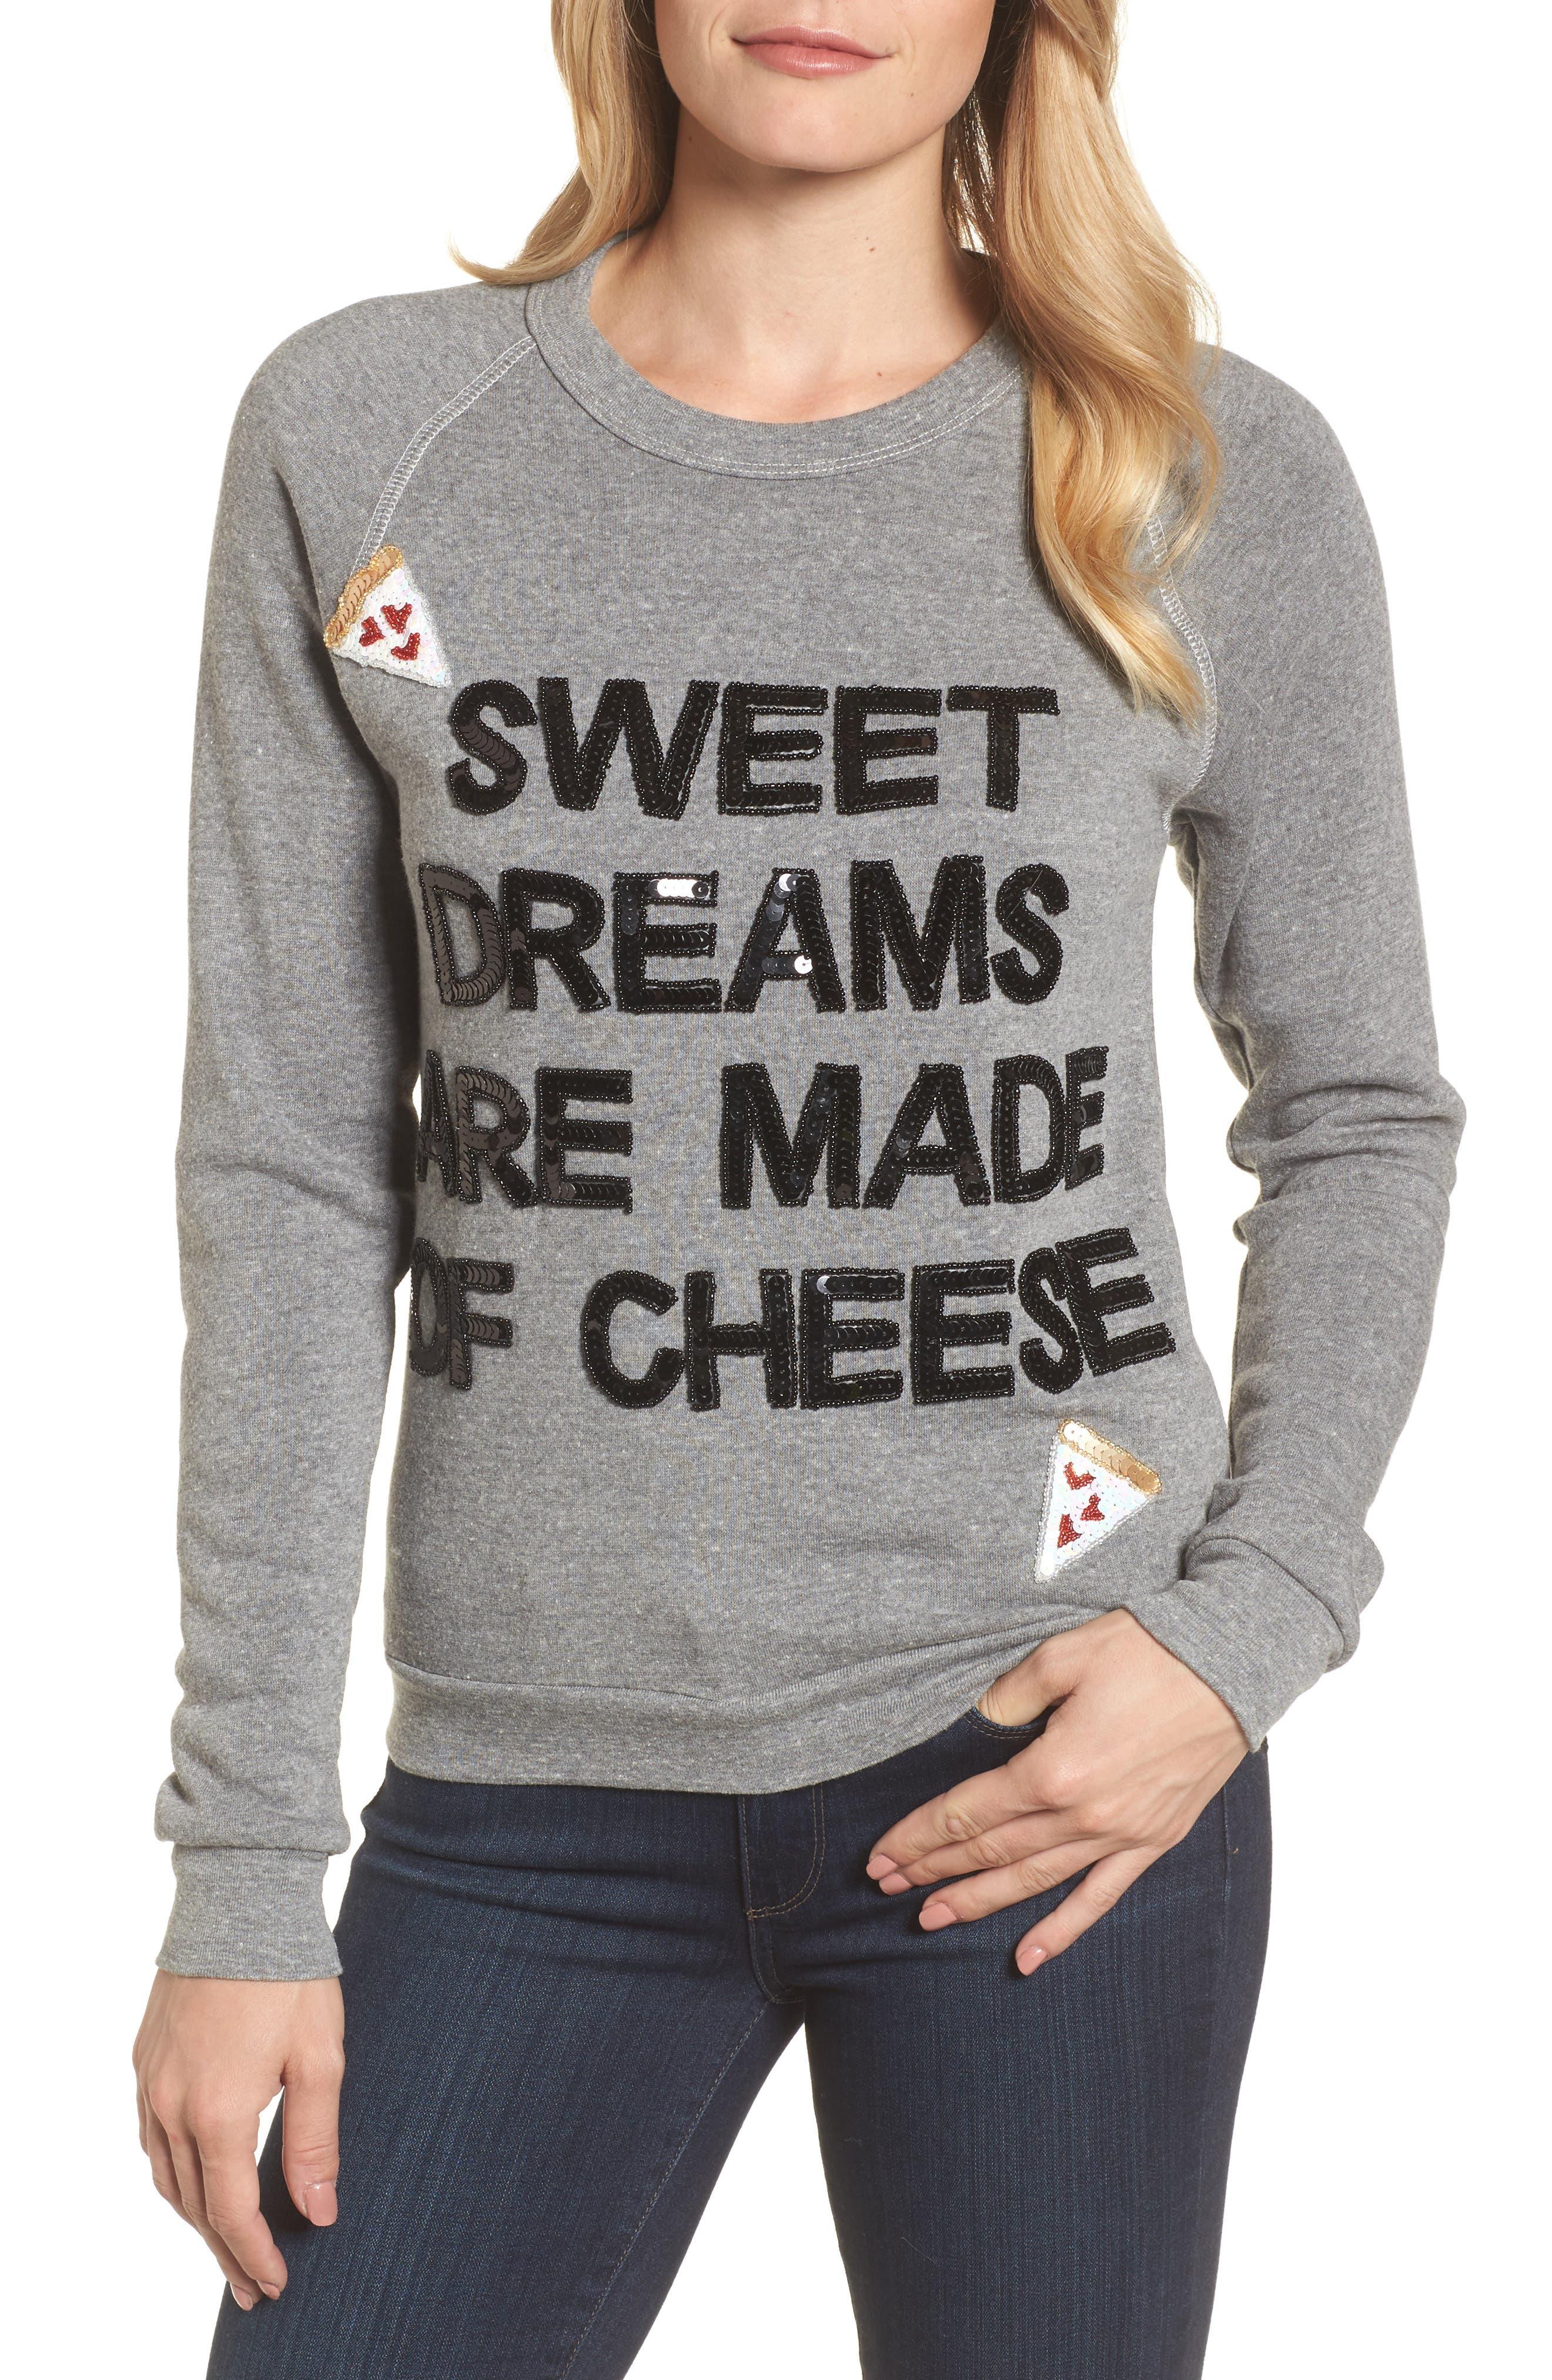 Sweet Dreams are Made of Cheese Sweatshirt,                             Main thumbnail 1, color,